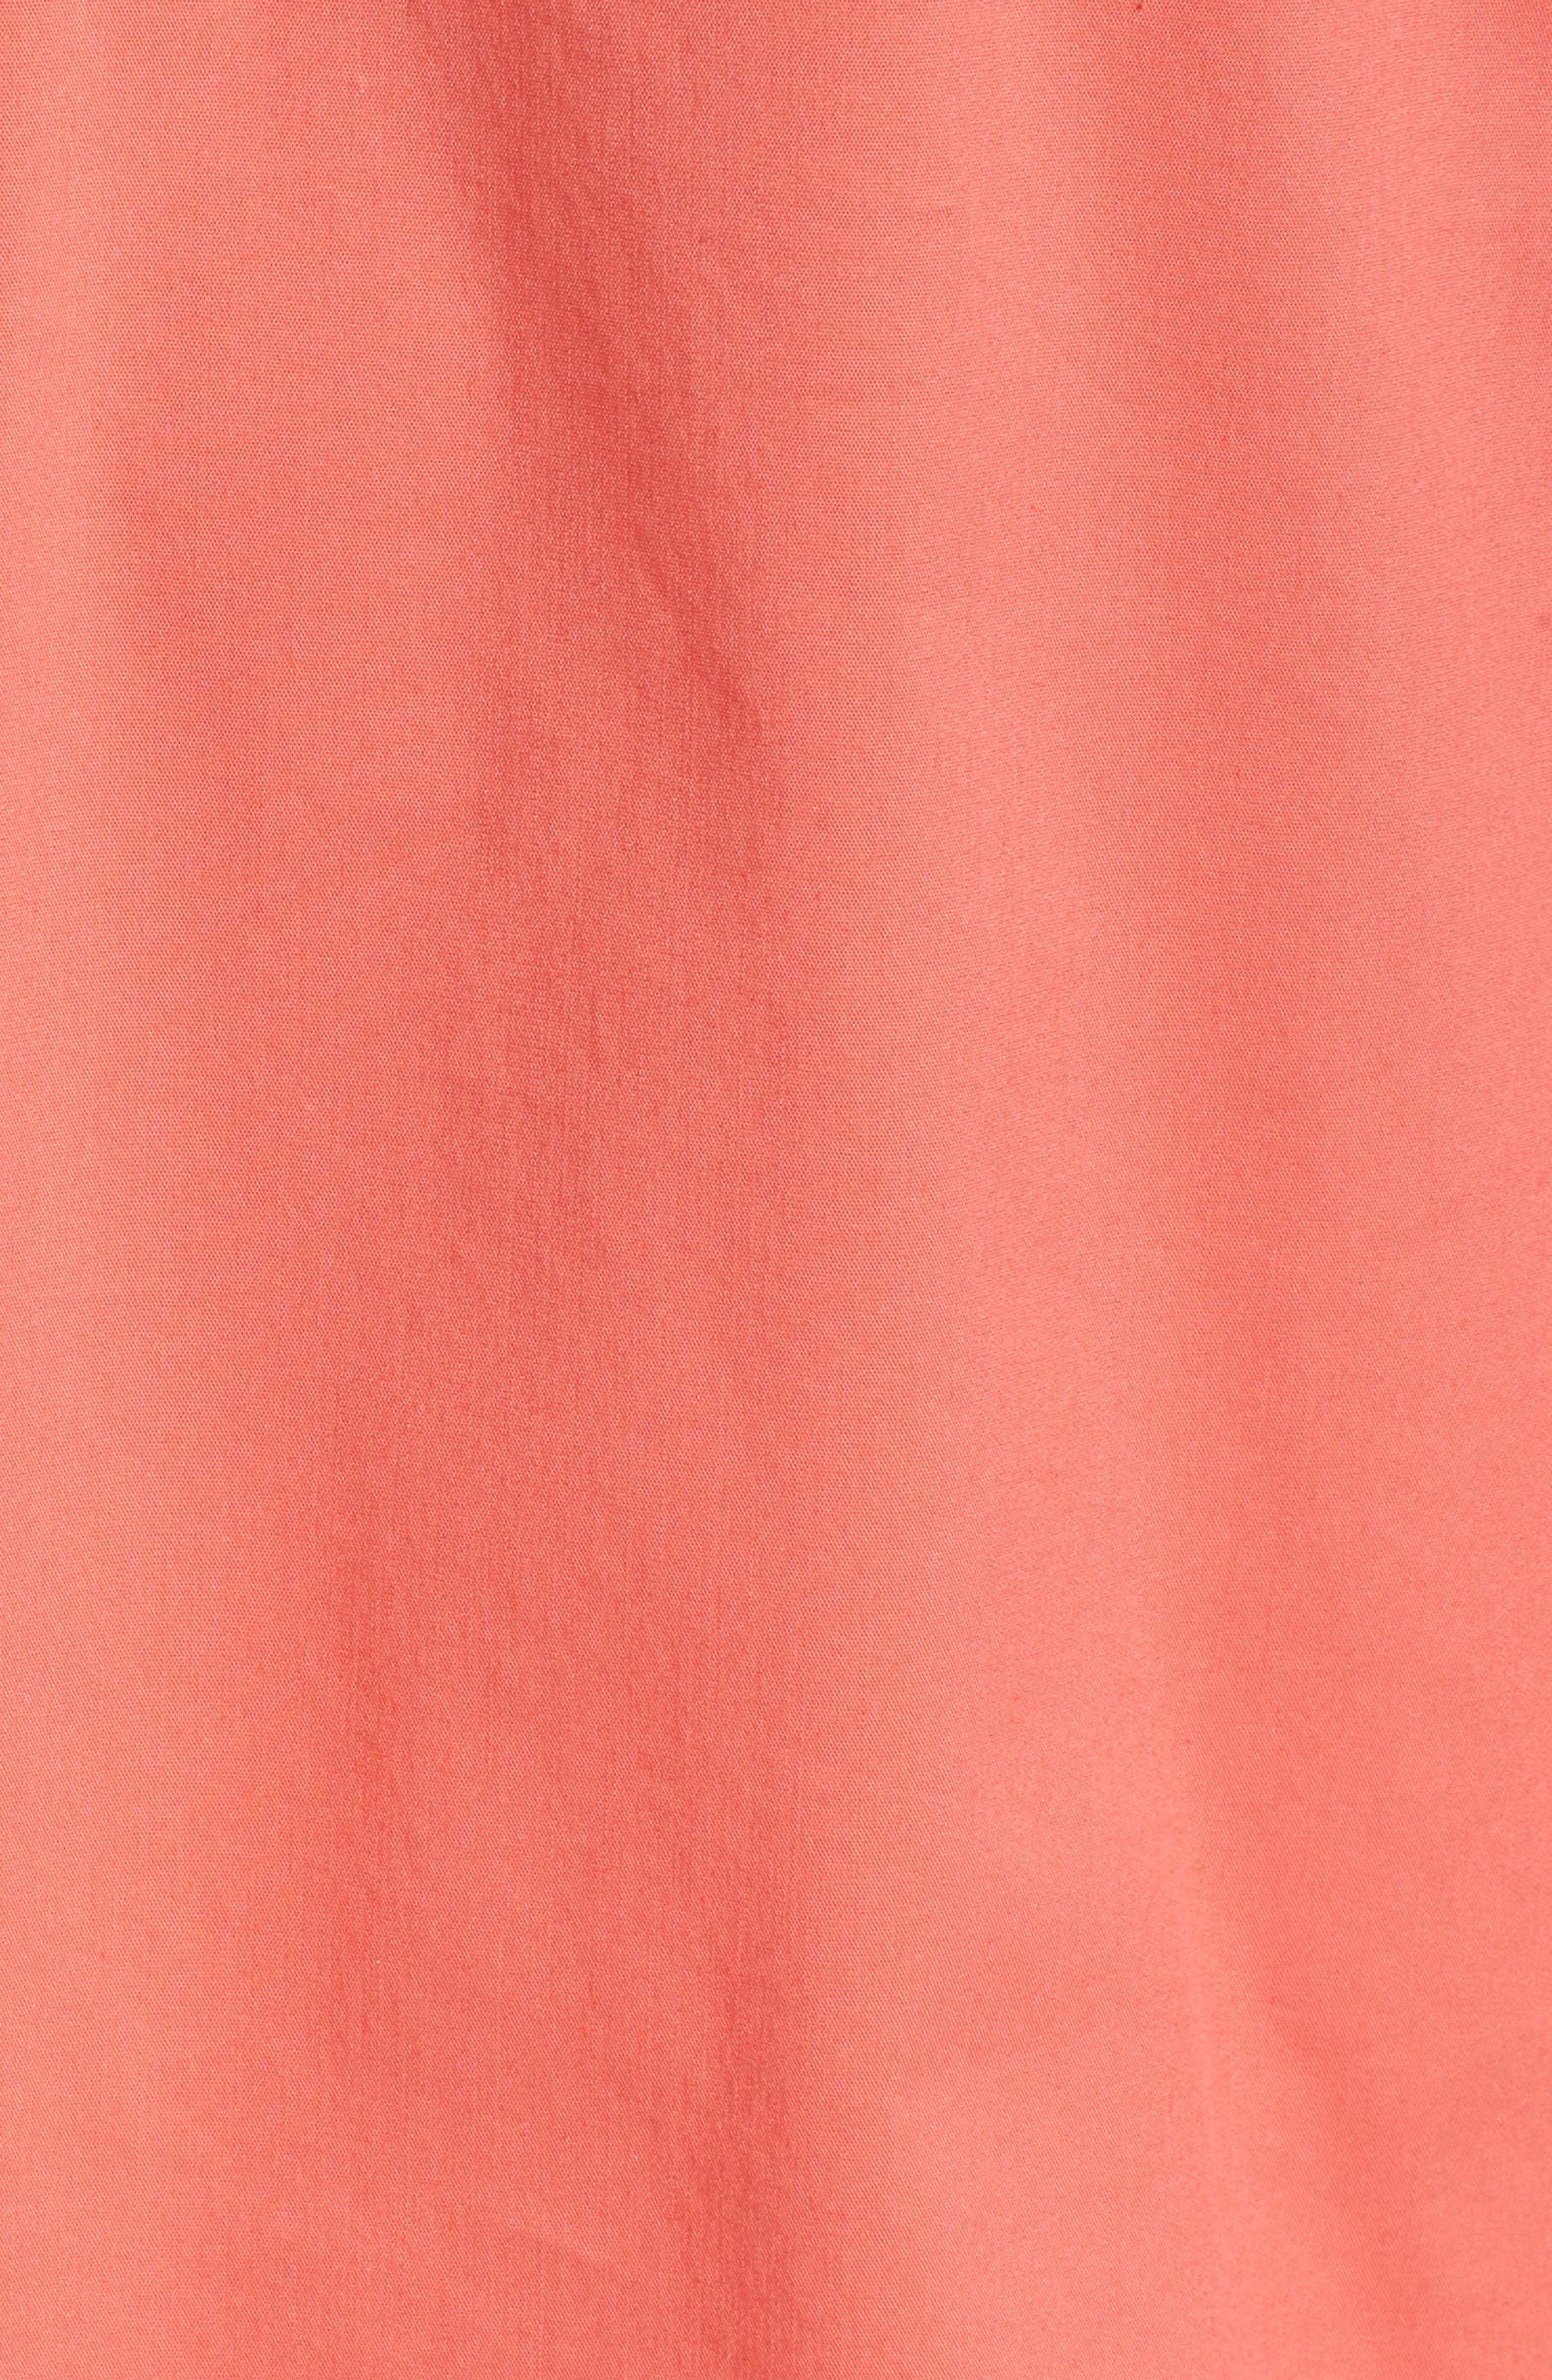 Ruffle Cotton Poplin Blend Top,                             Alternate thumbnail 25, color,